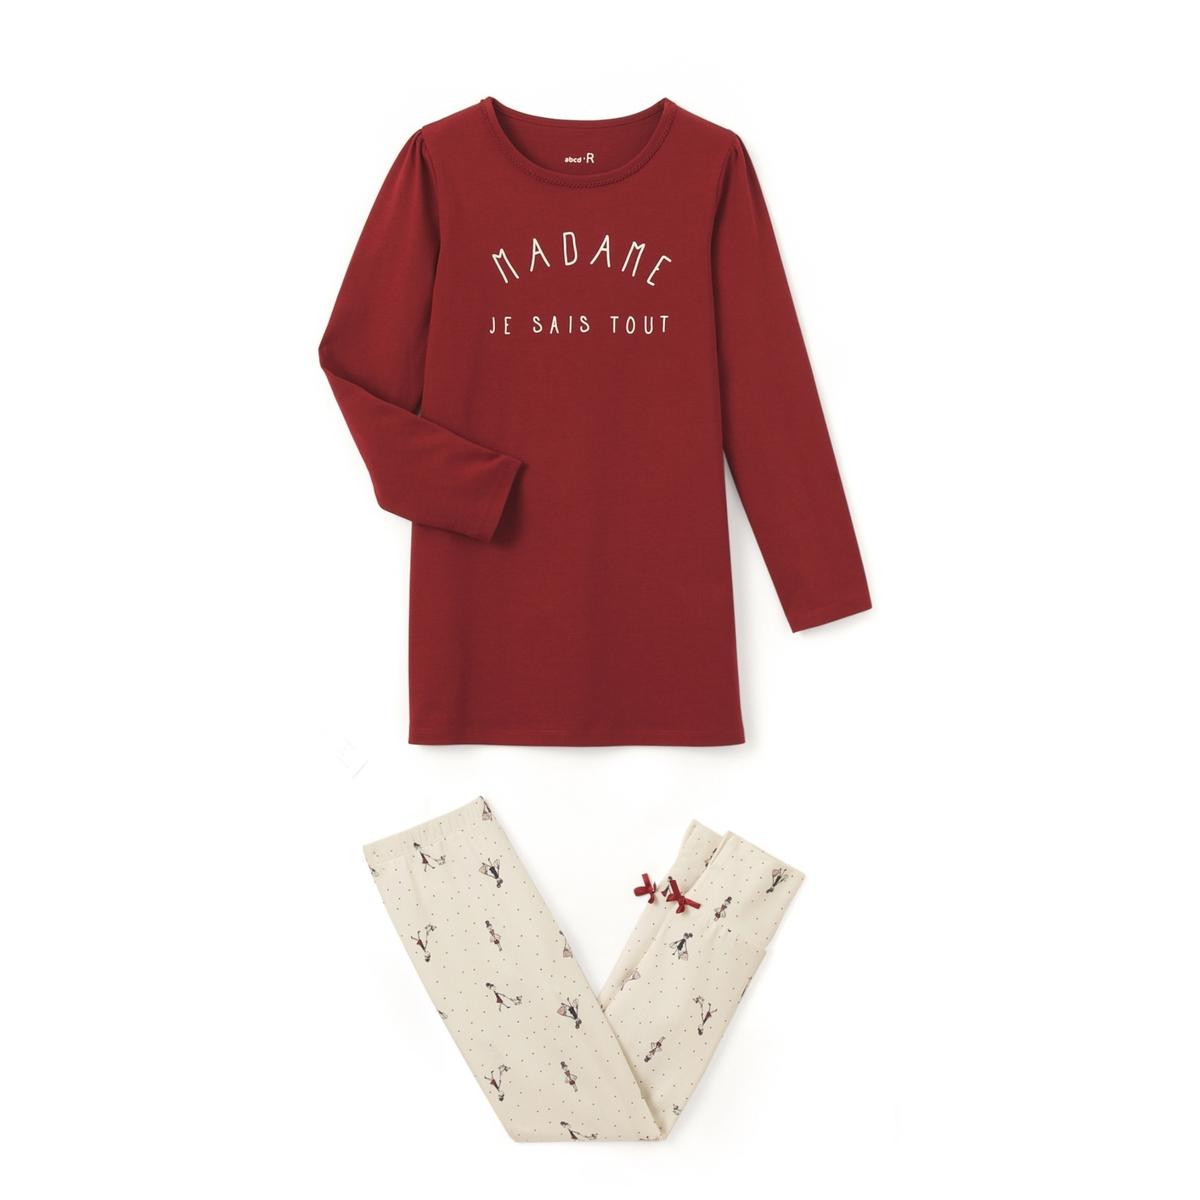 Пижама из джерси, 2-12 лет пижама из атласа и джерси